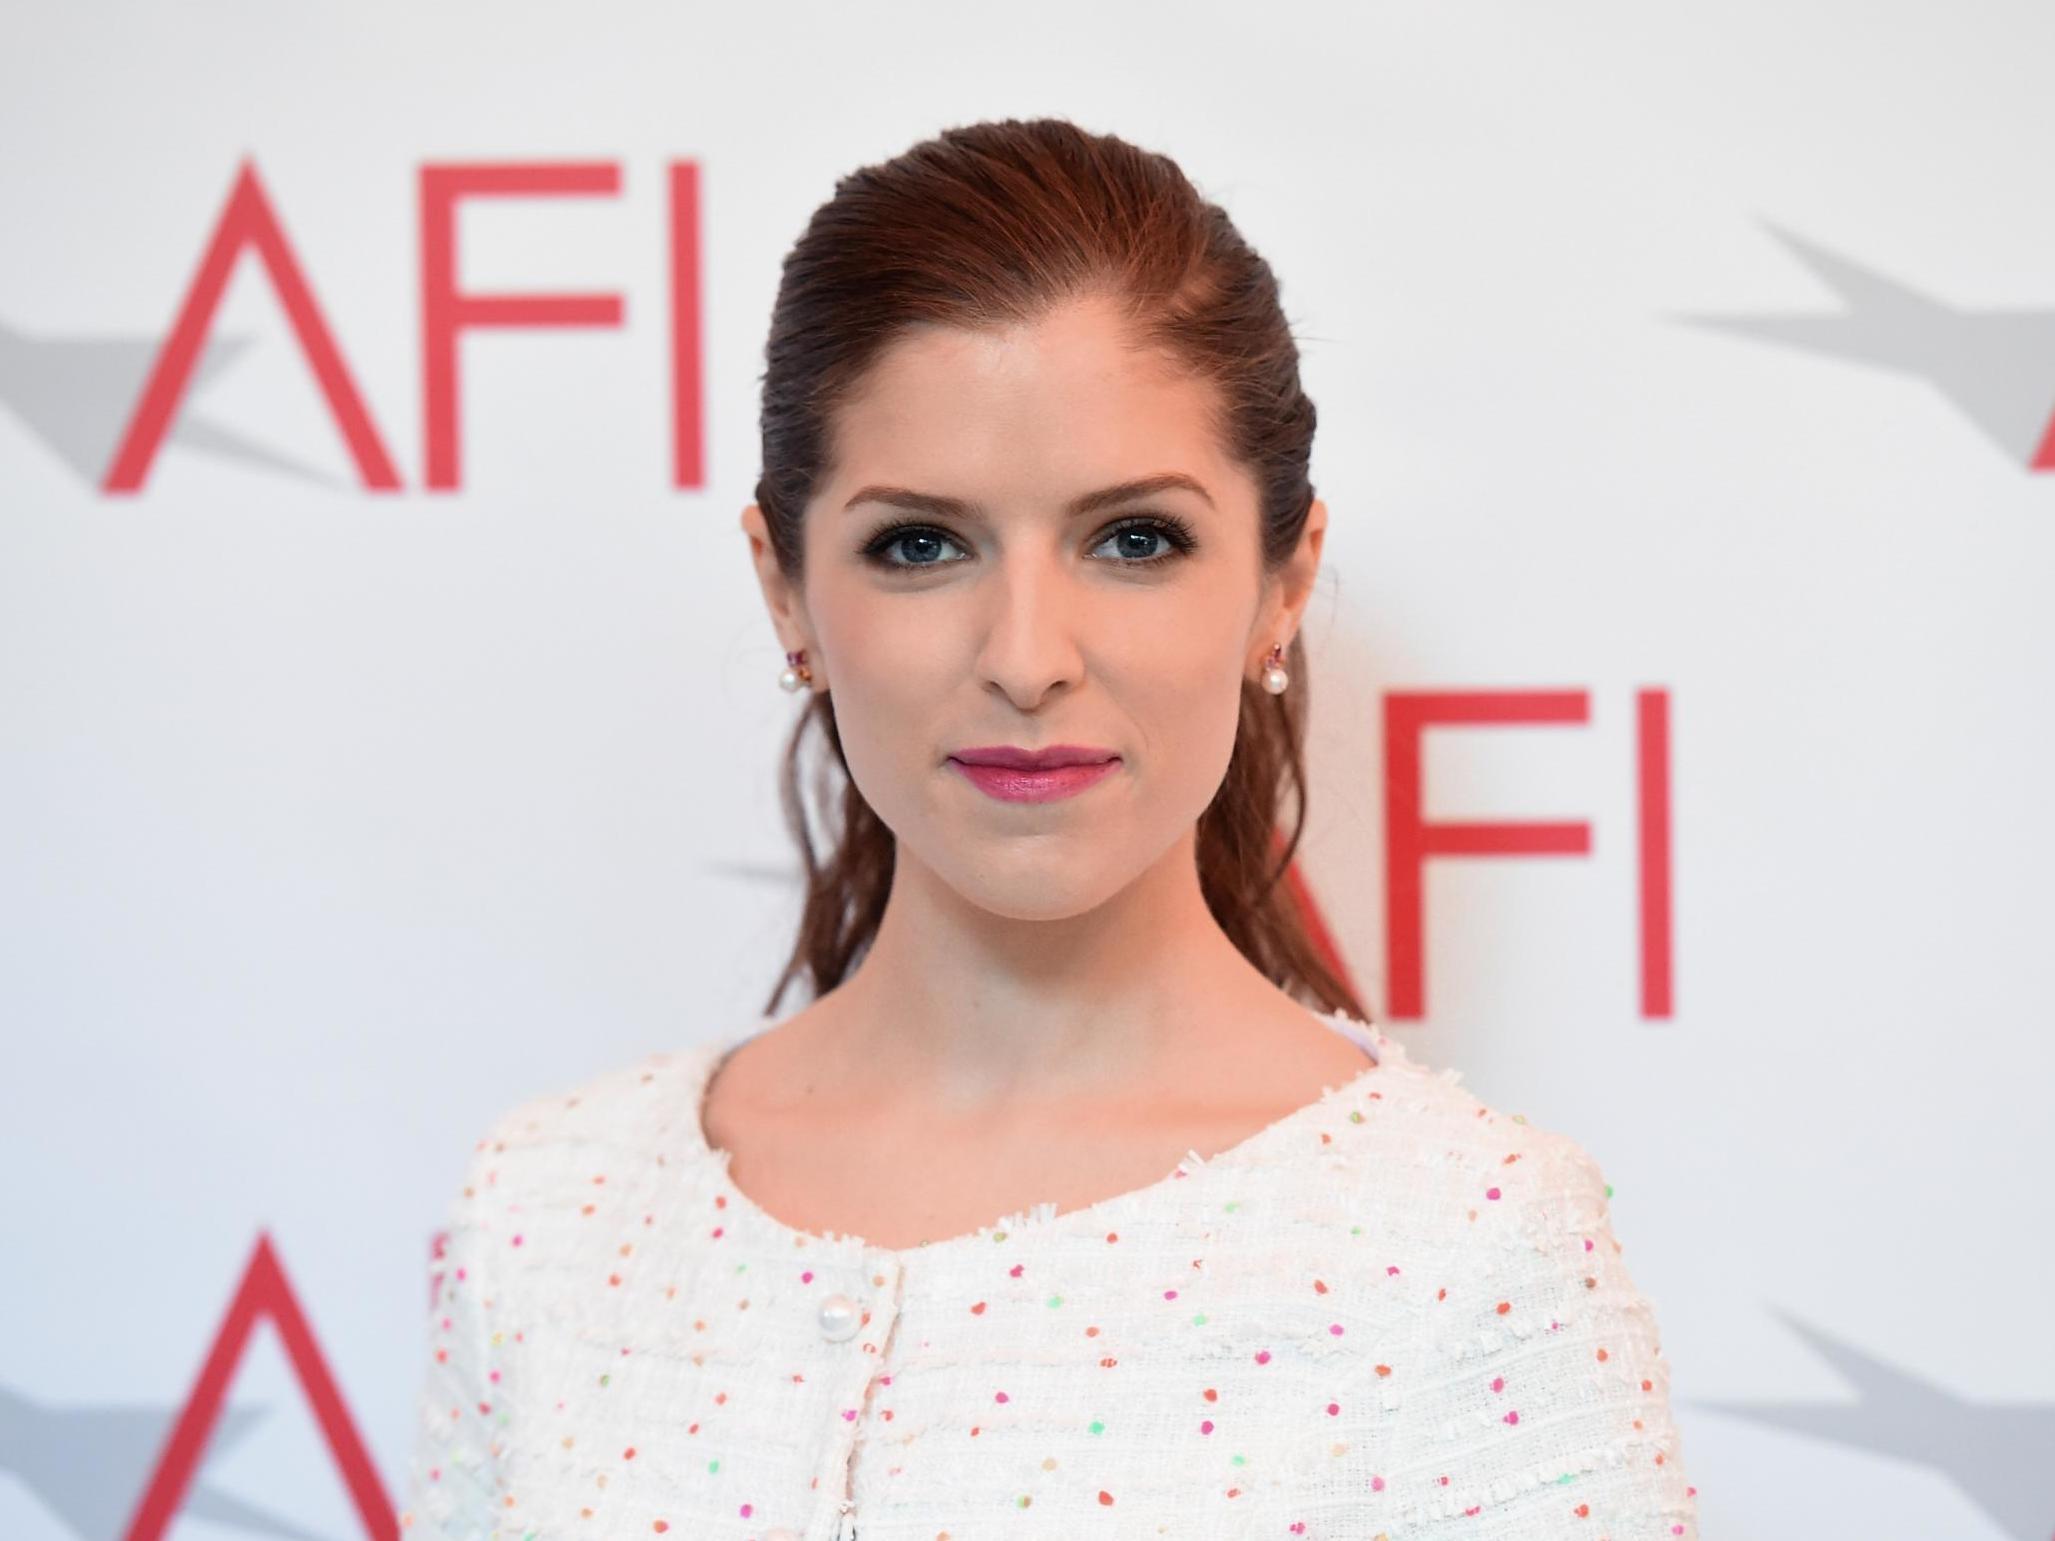 Nicknames for Anna